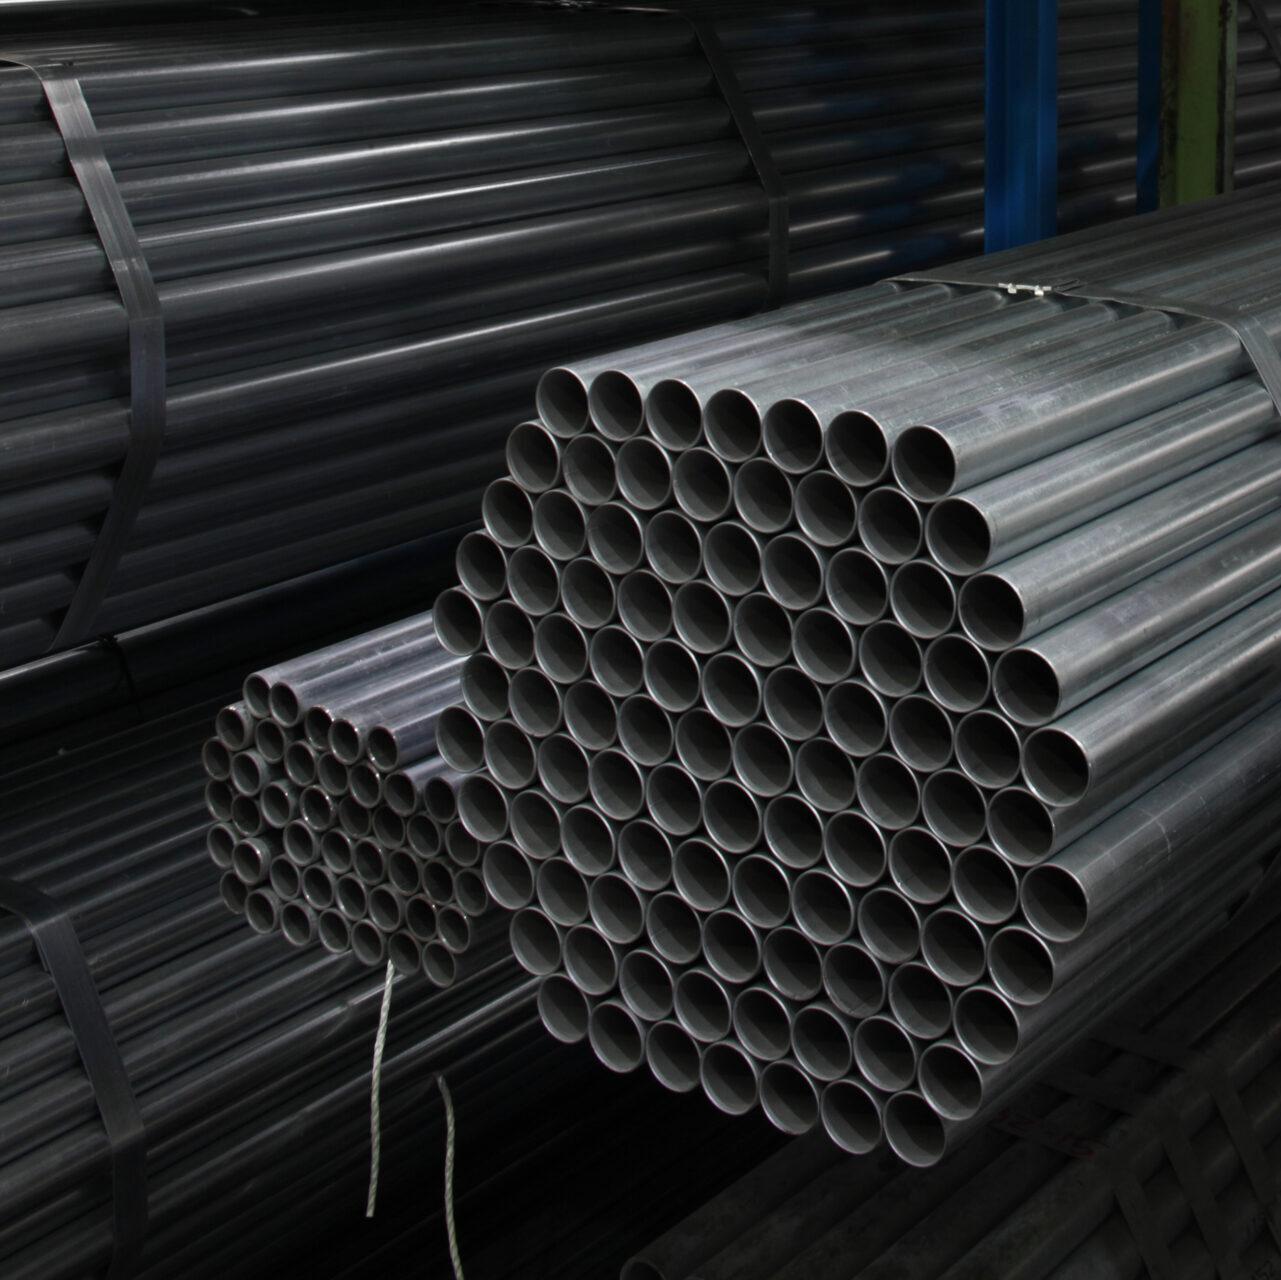 STKM11A 機械構造用炭素鋼鋼管(JIS G 3445)